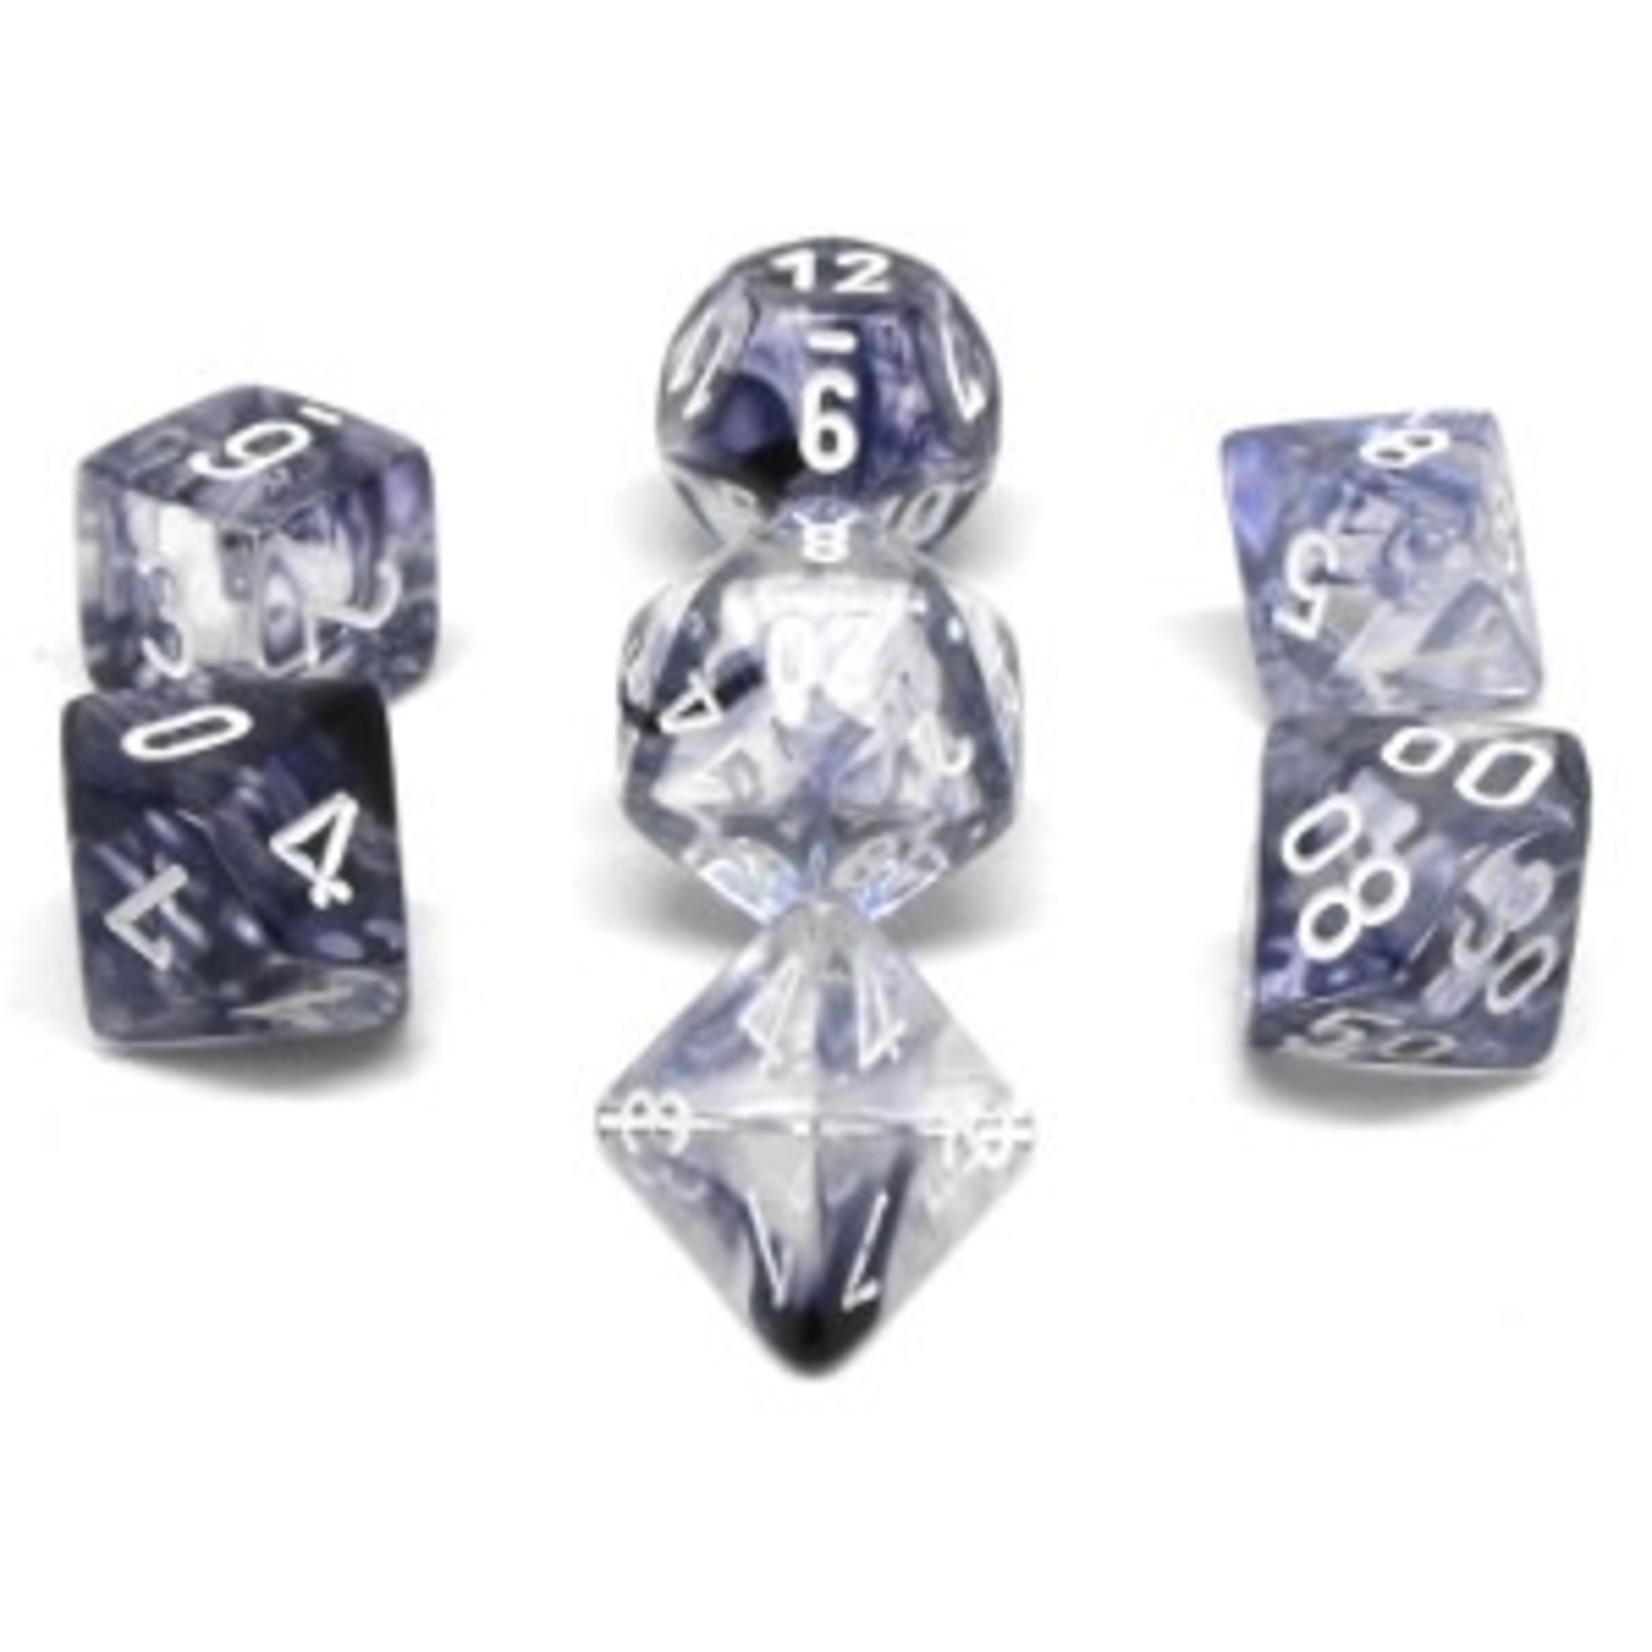 Chessex Set 7D Poly Nebula Black/white